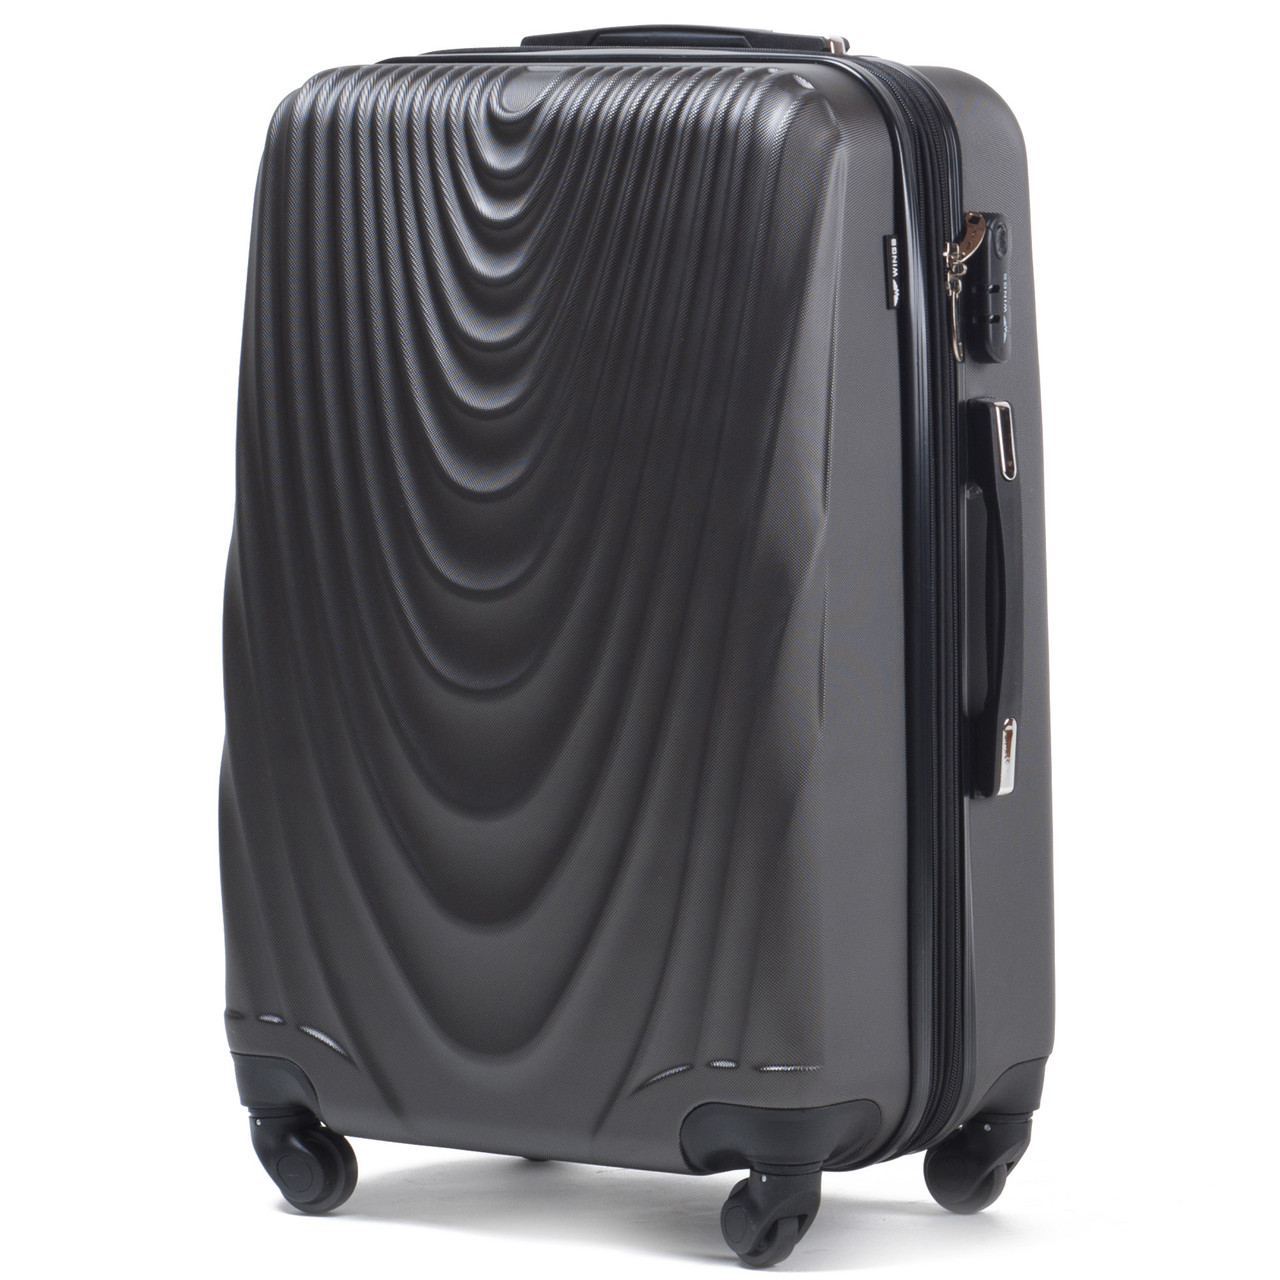 Малый пластиковый чемодан Wings 304 на 4 колесах серый